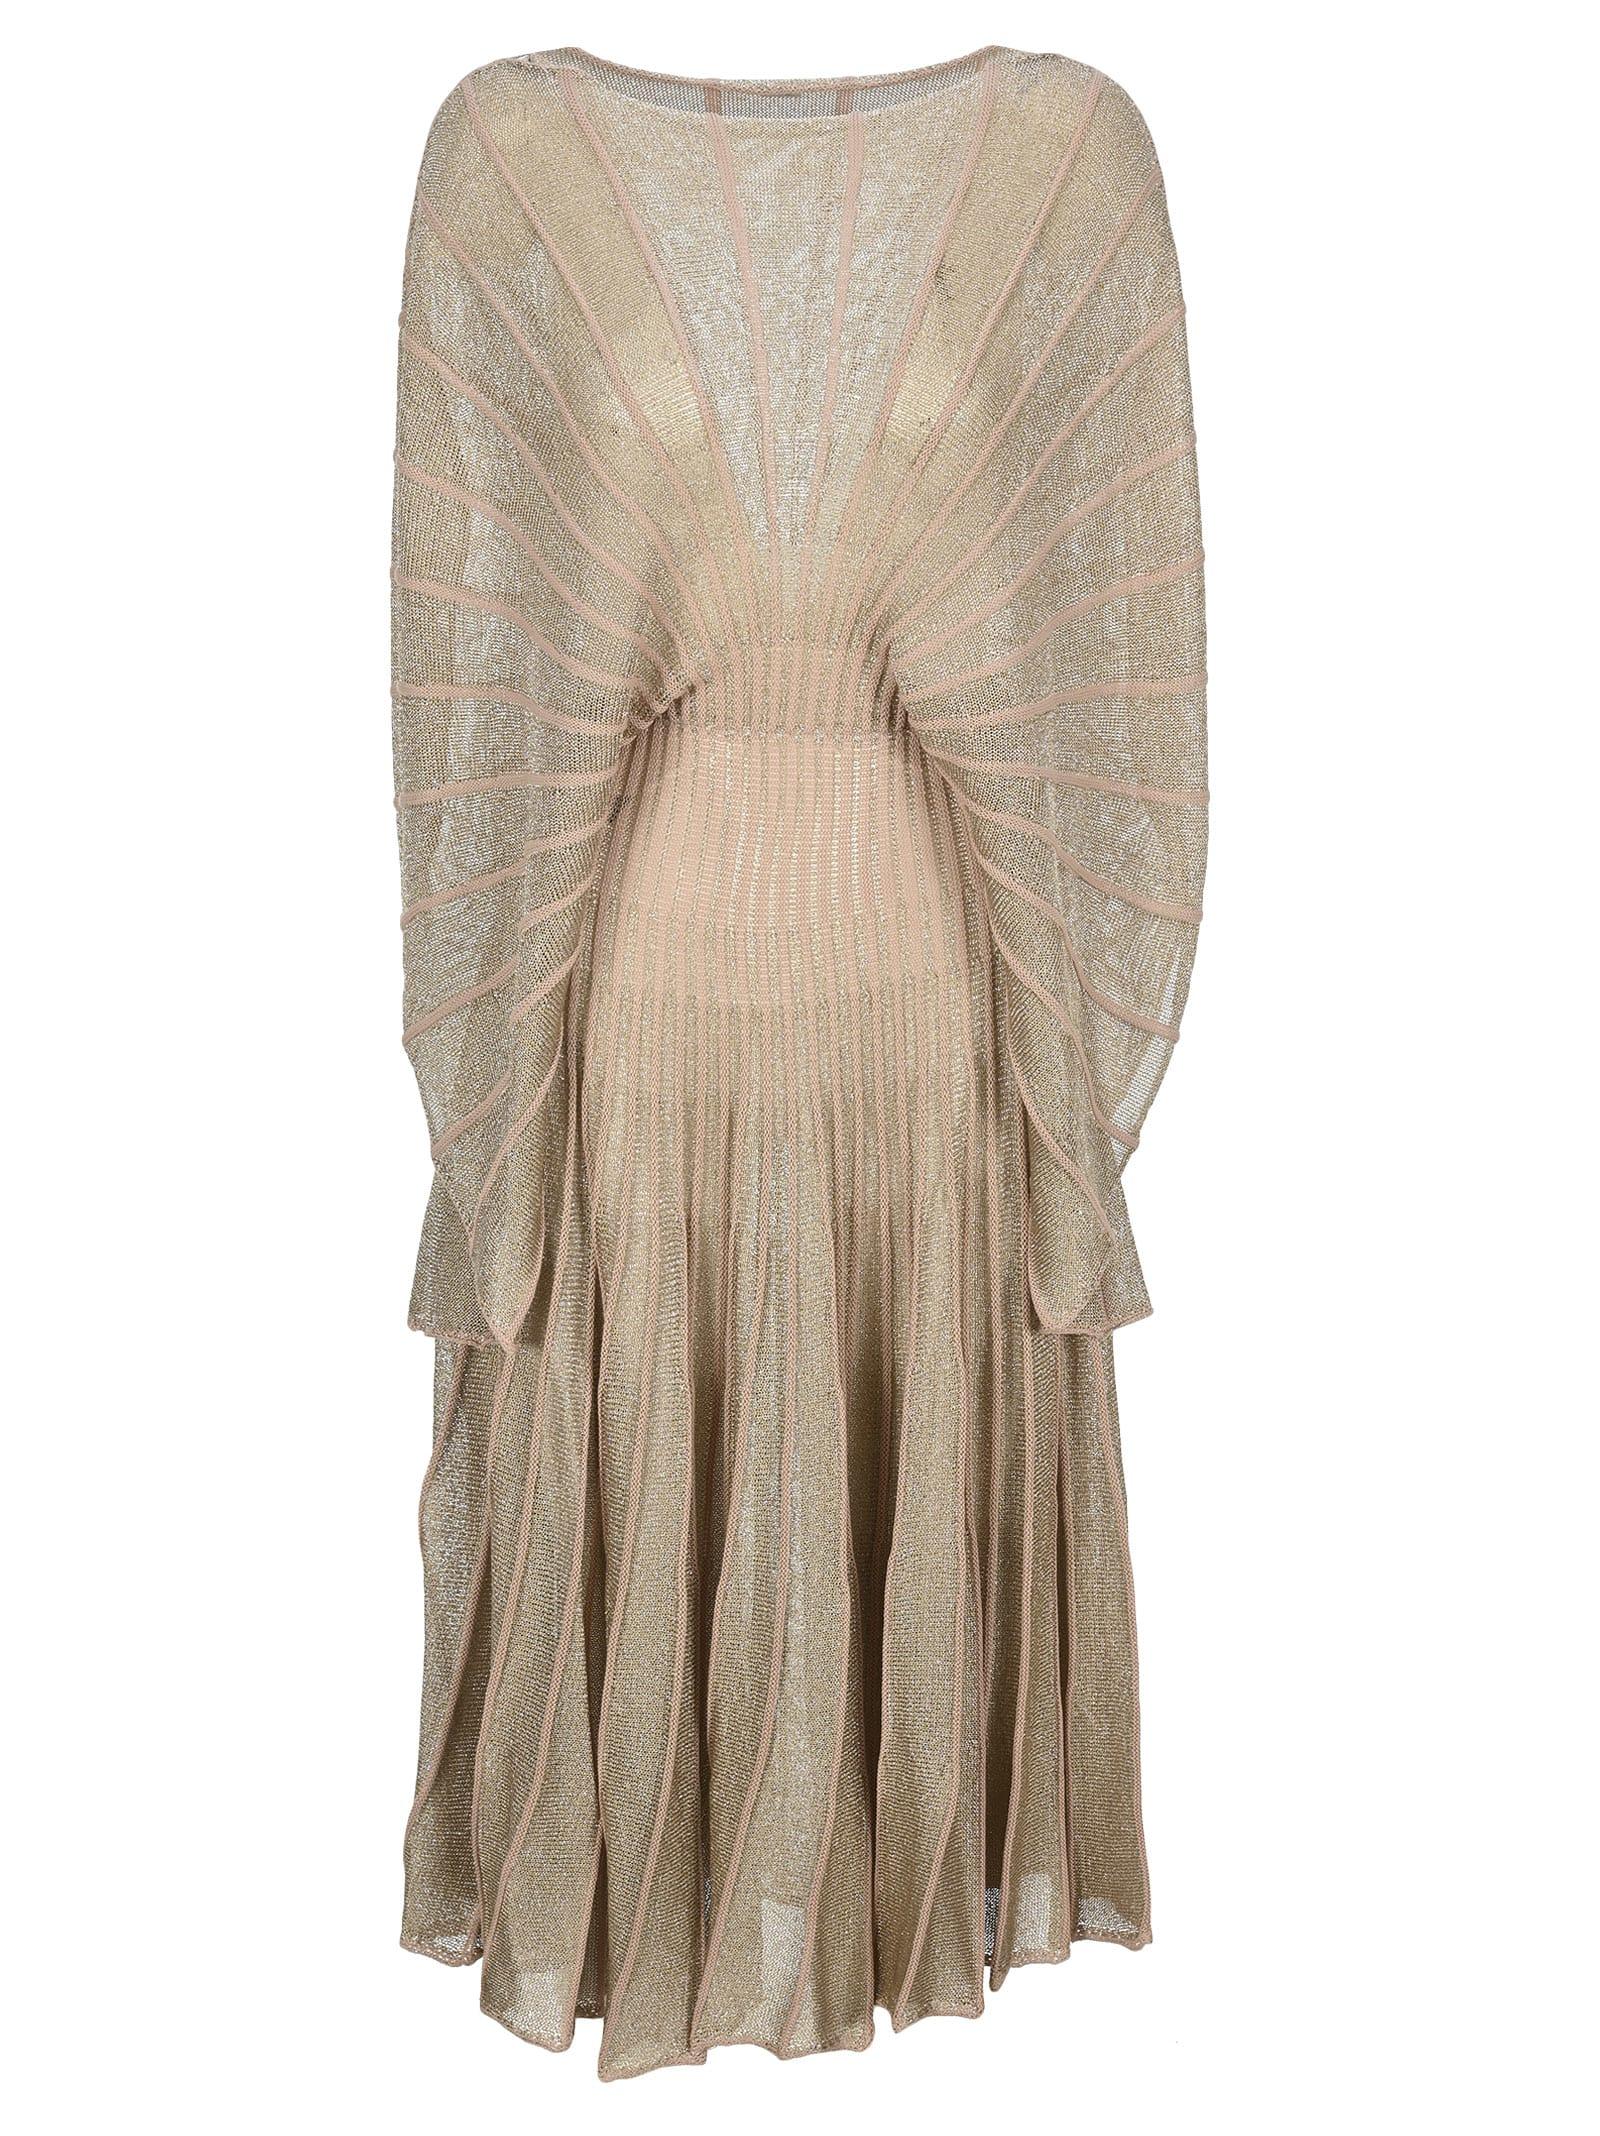 Buy Stella Mccartney Knit And Lurex Midi Dress online, shop Stella McCartney with free shipping